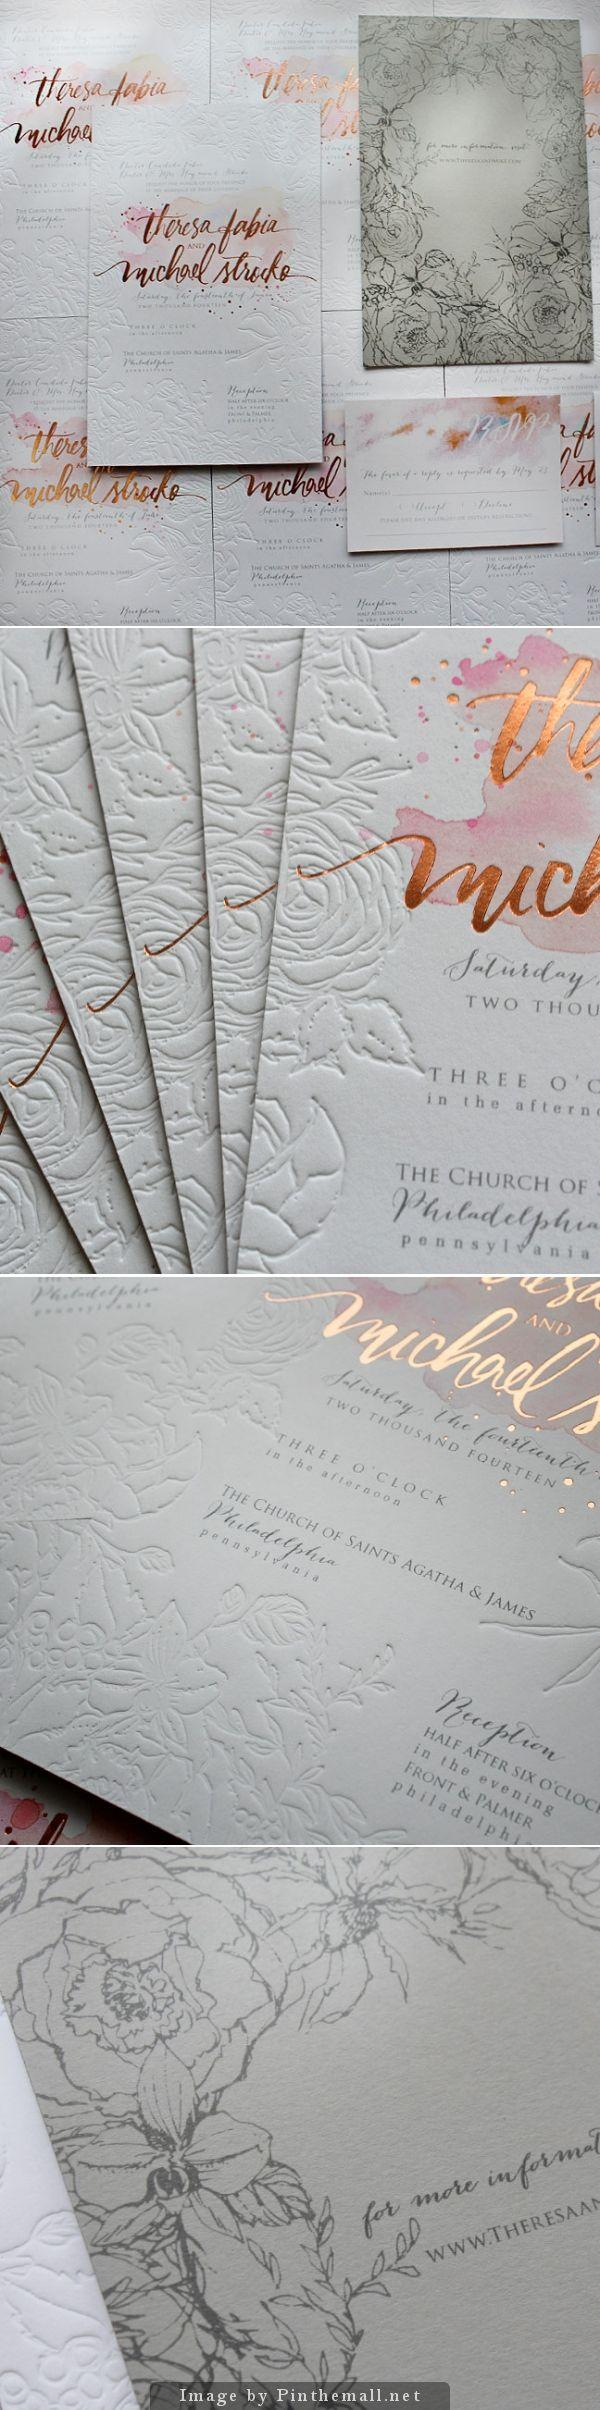 Mariage - How Inviting! (invitations)